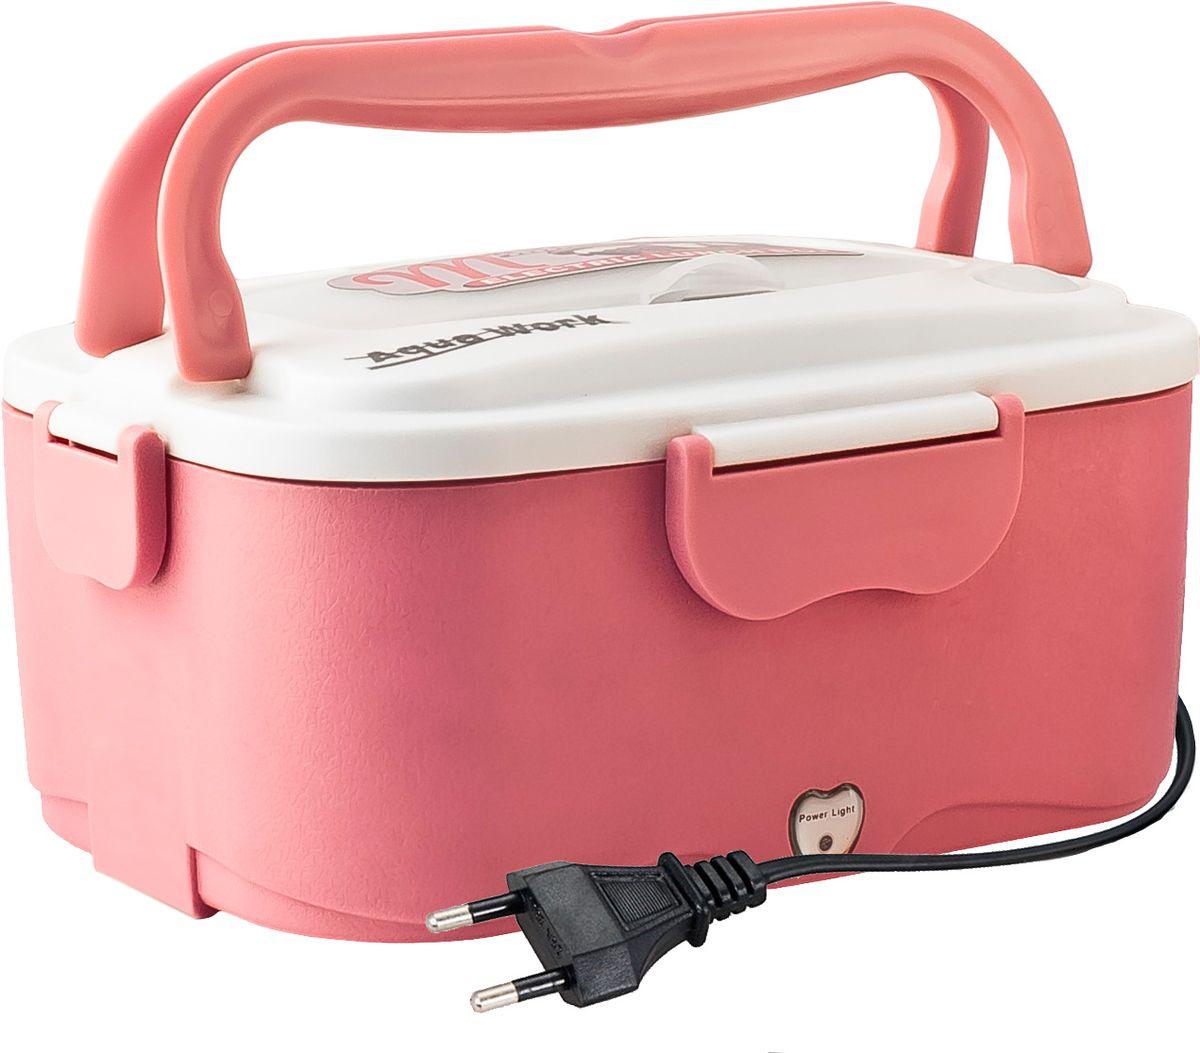 Aqua Work С5, Pink ланчбокс с подогревом 220В - Подогреватели посуды